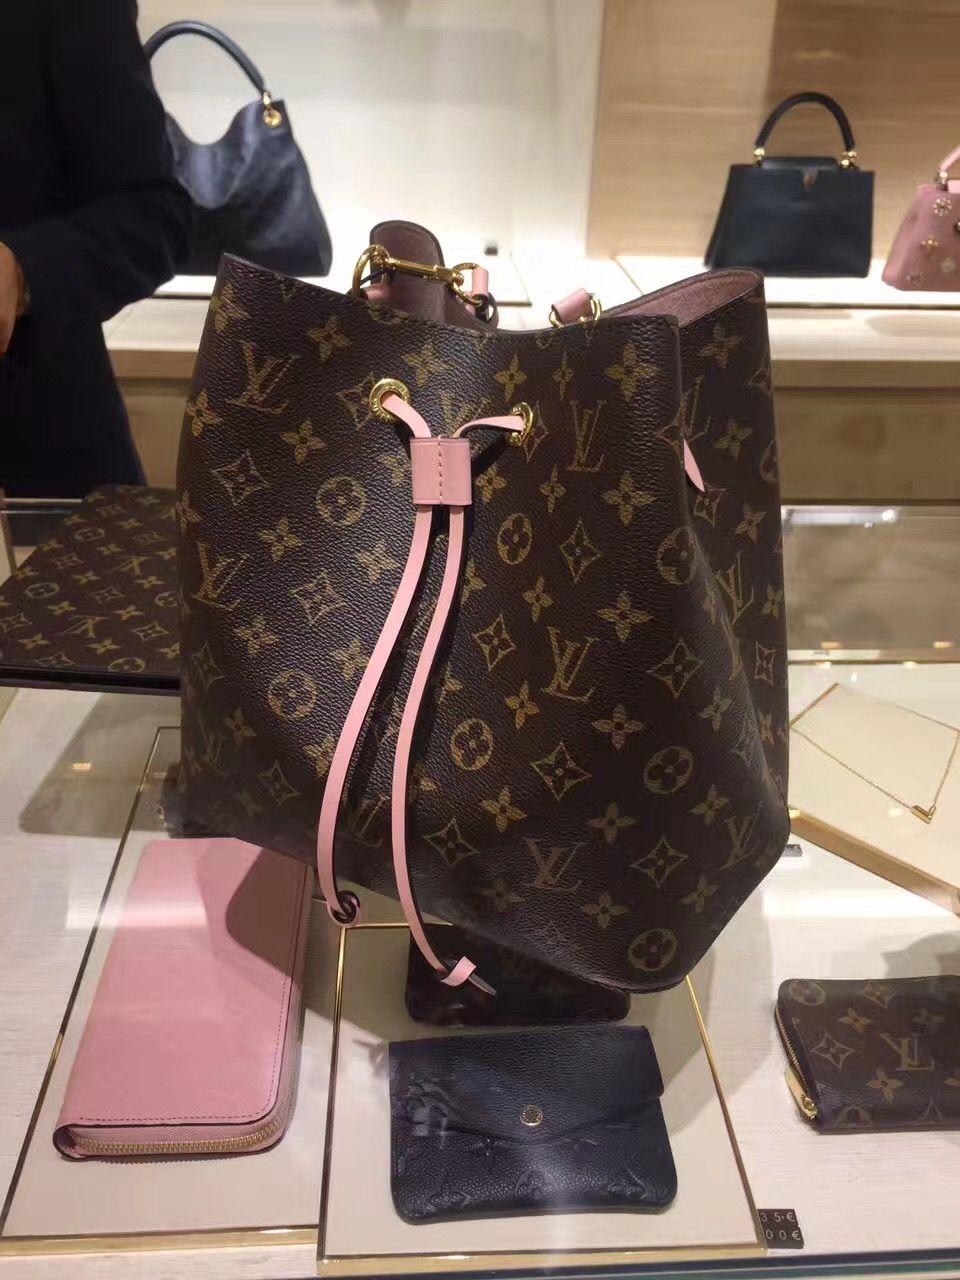 1219e9e60542 Louis Vuitton Neonoe Shoulder Bag M44022 Rose